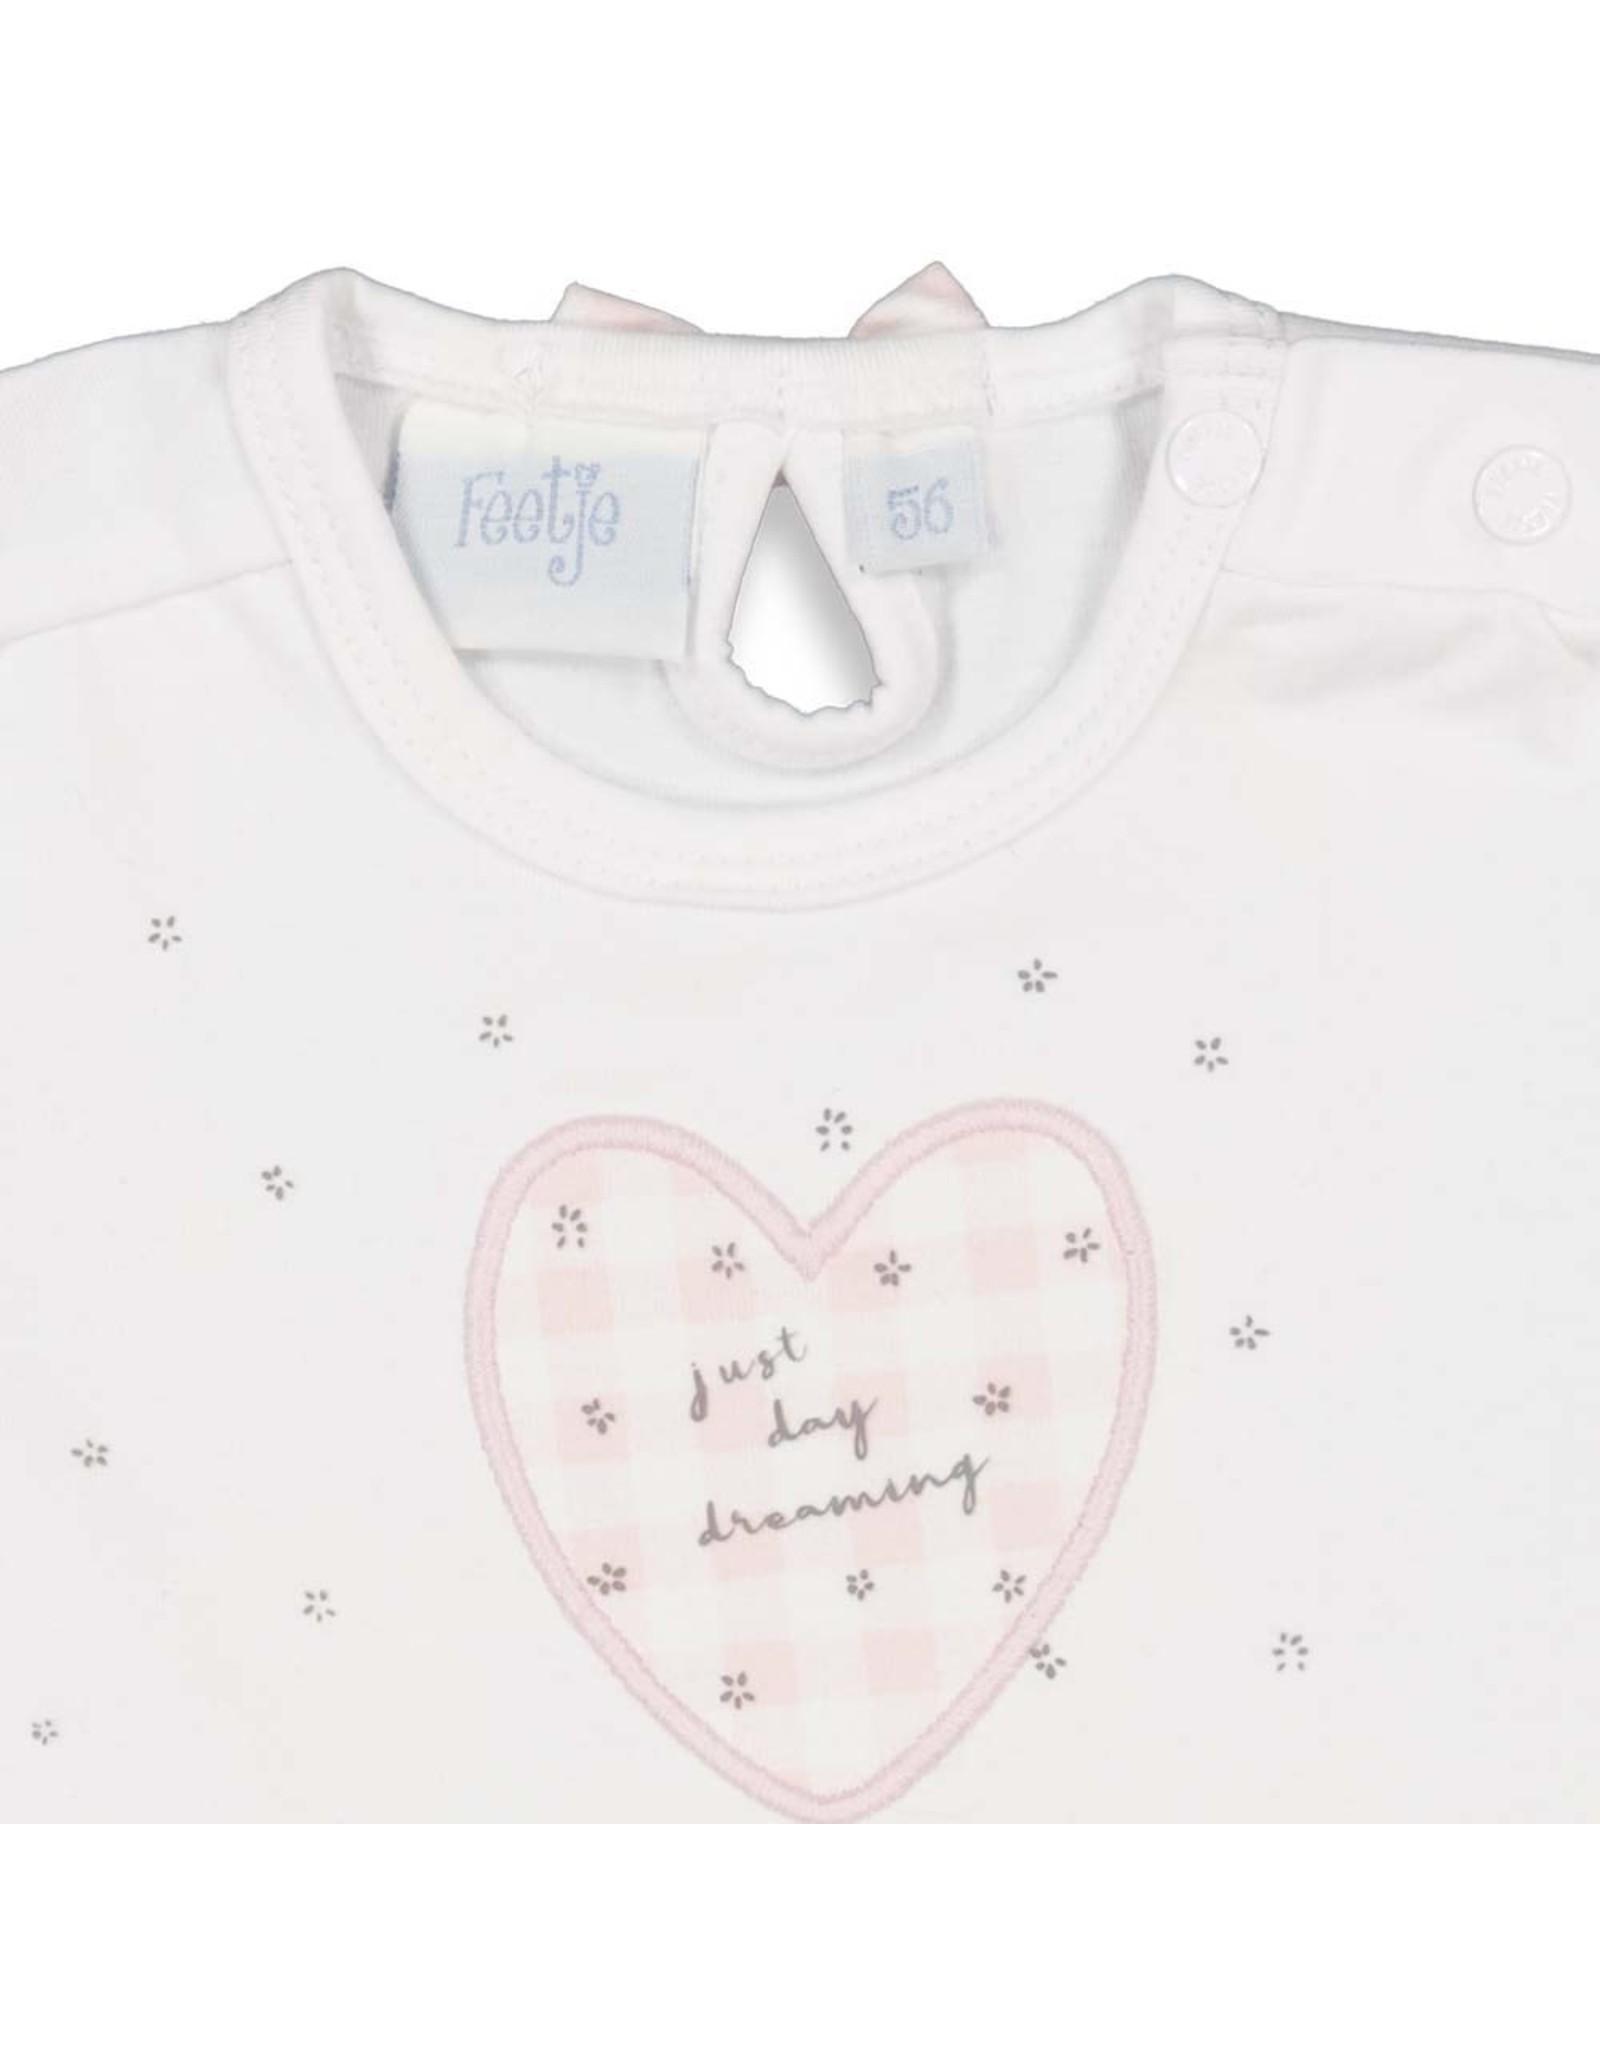 Feetje T-shirt - Daydreaming